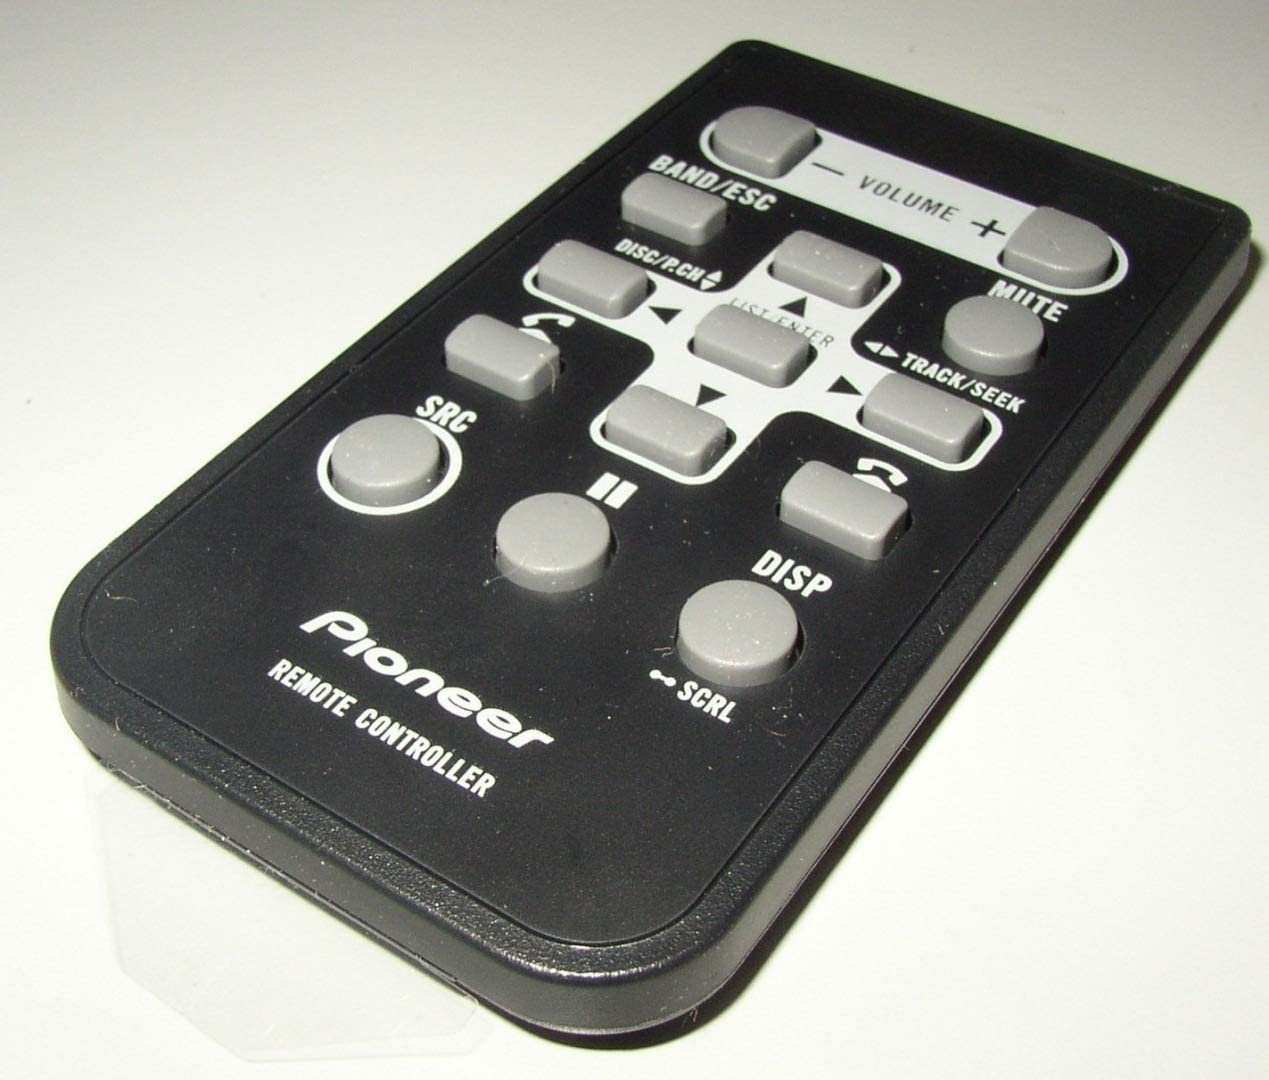 QXE1047 In-Dash Car Audio CD Receiver Remote Control PIONEER OEM Original Part